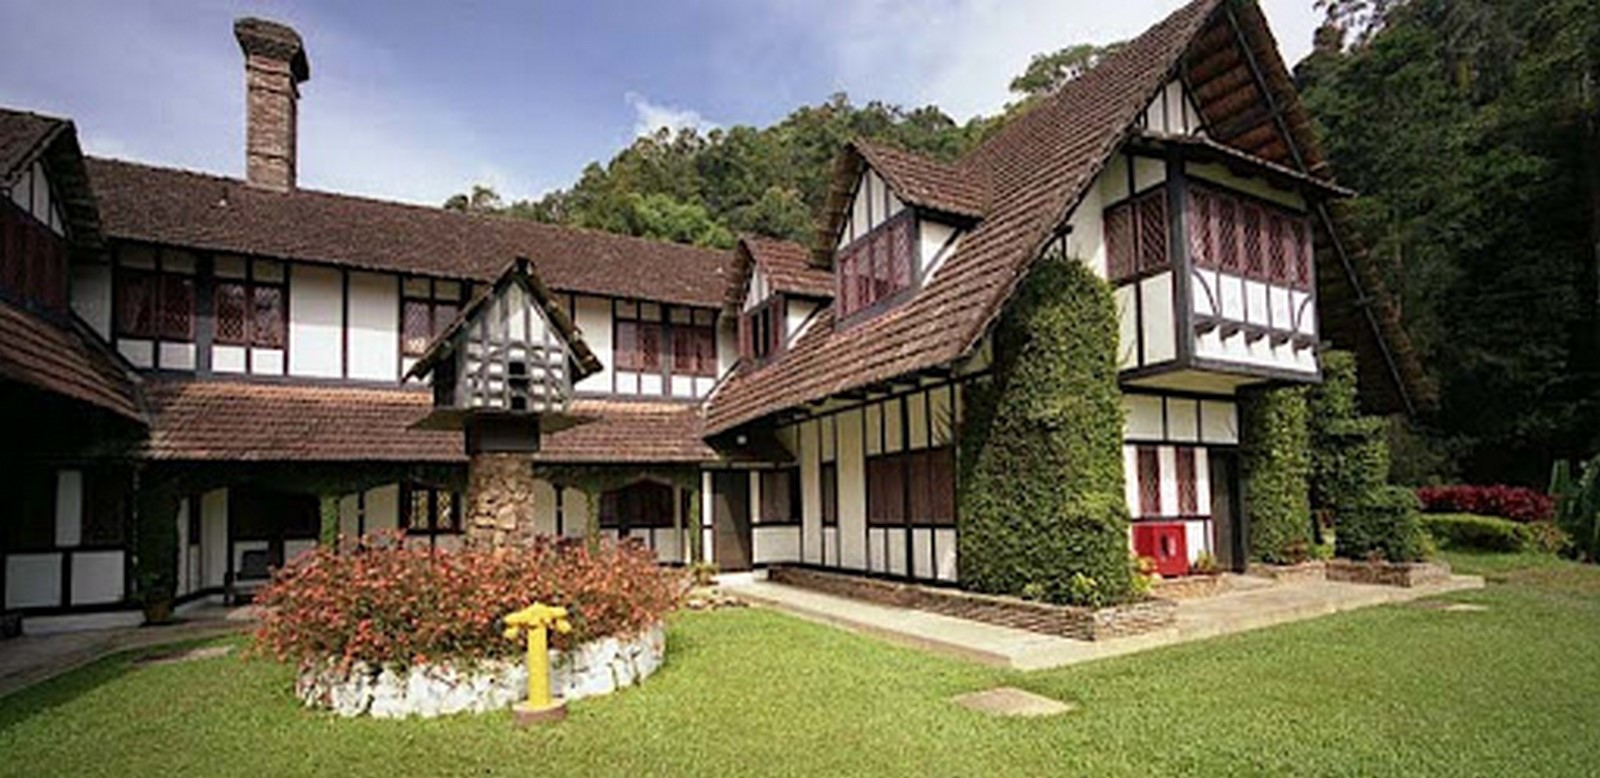 The Lake House, Cameron Highlands, Malaysia - Sheet2